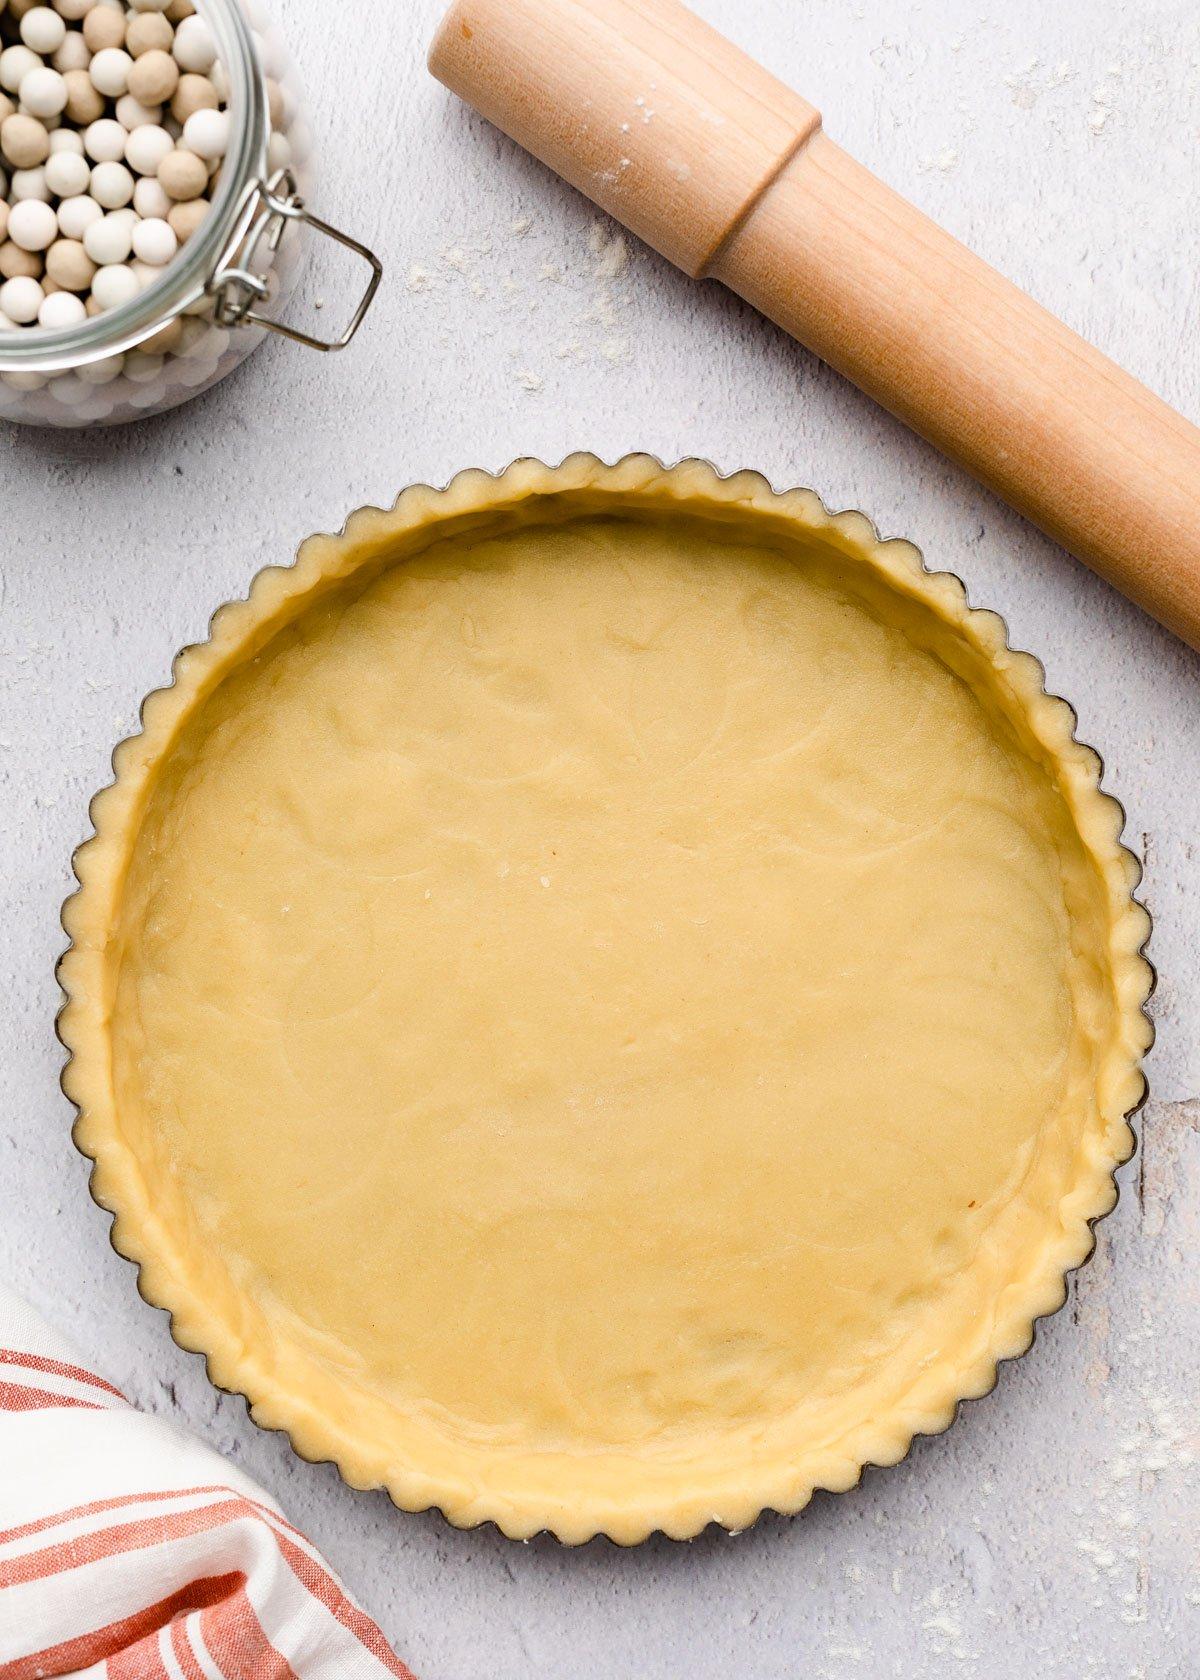 unbaked pate sablee in a tart pan